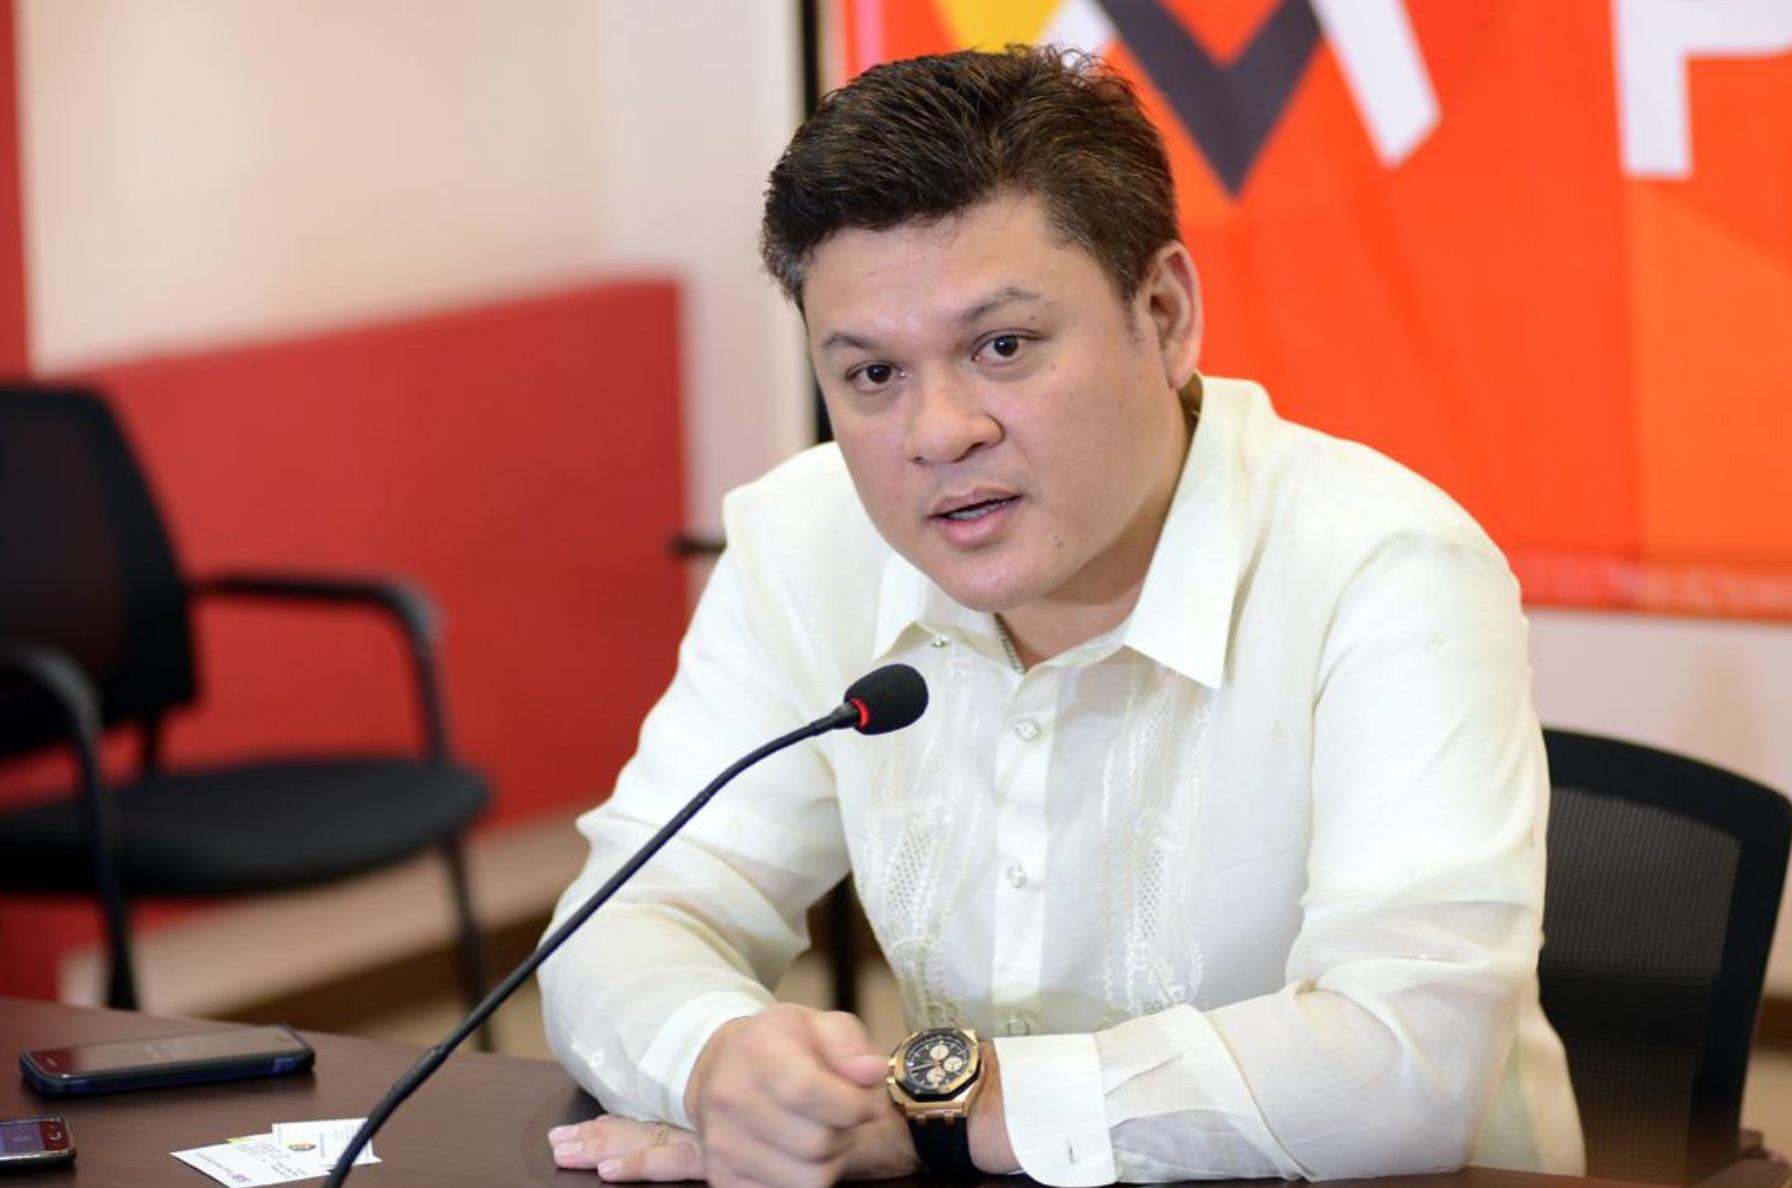 duterte accepts paolo resignation as davao city vice mayor